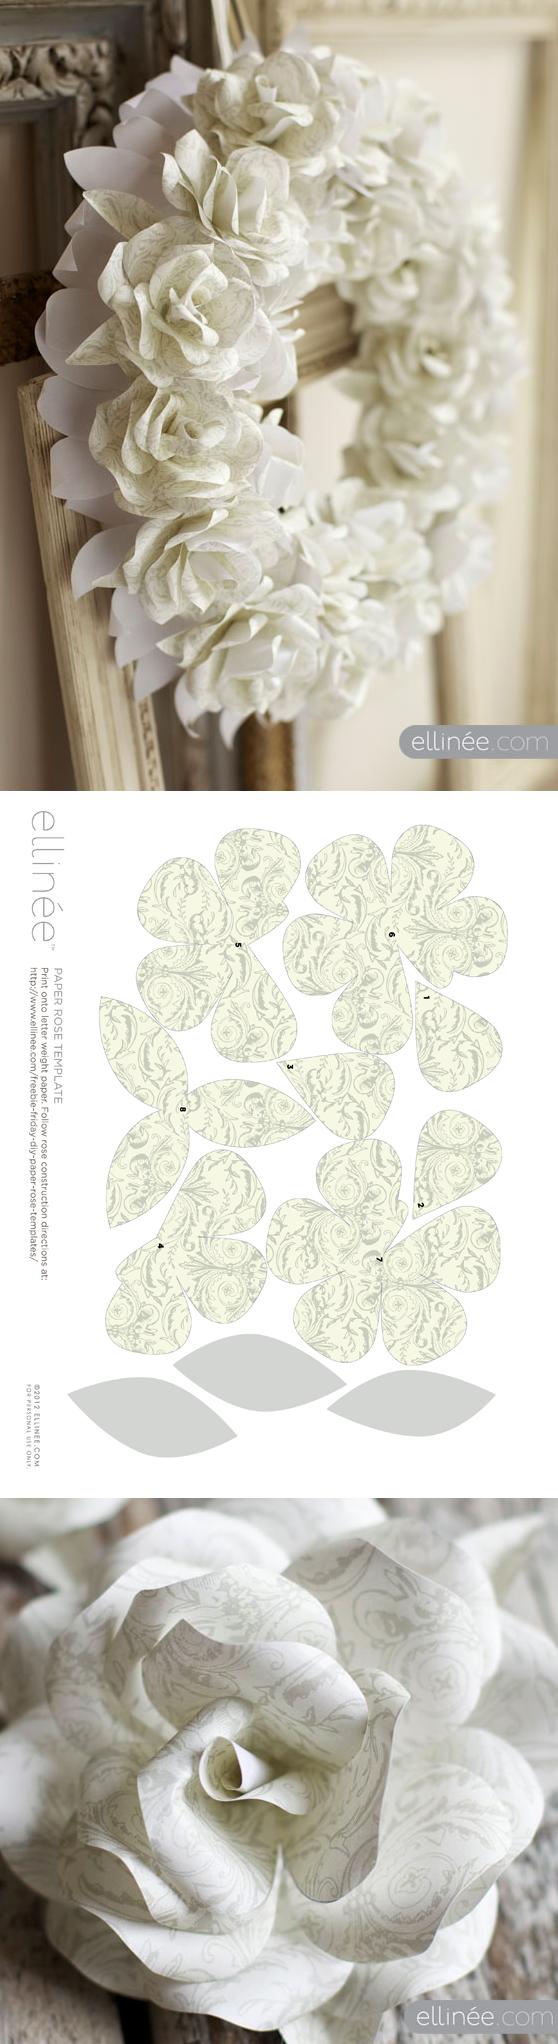 Paper Rose Wreath  free templateprintable u tutorial  from